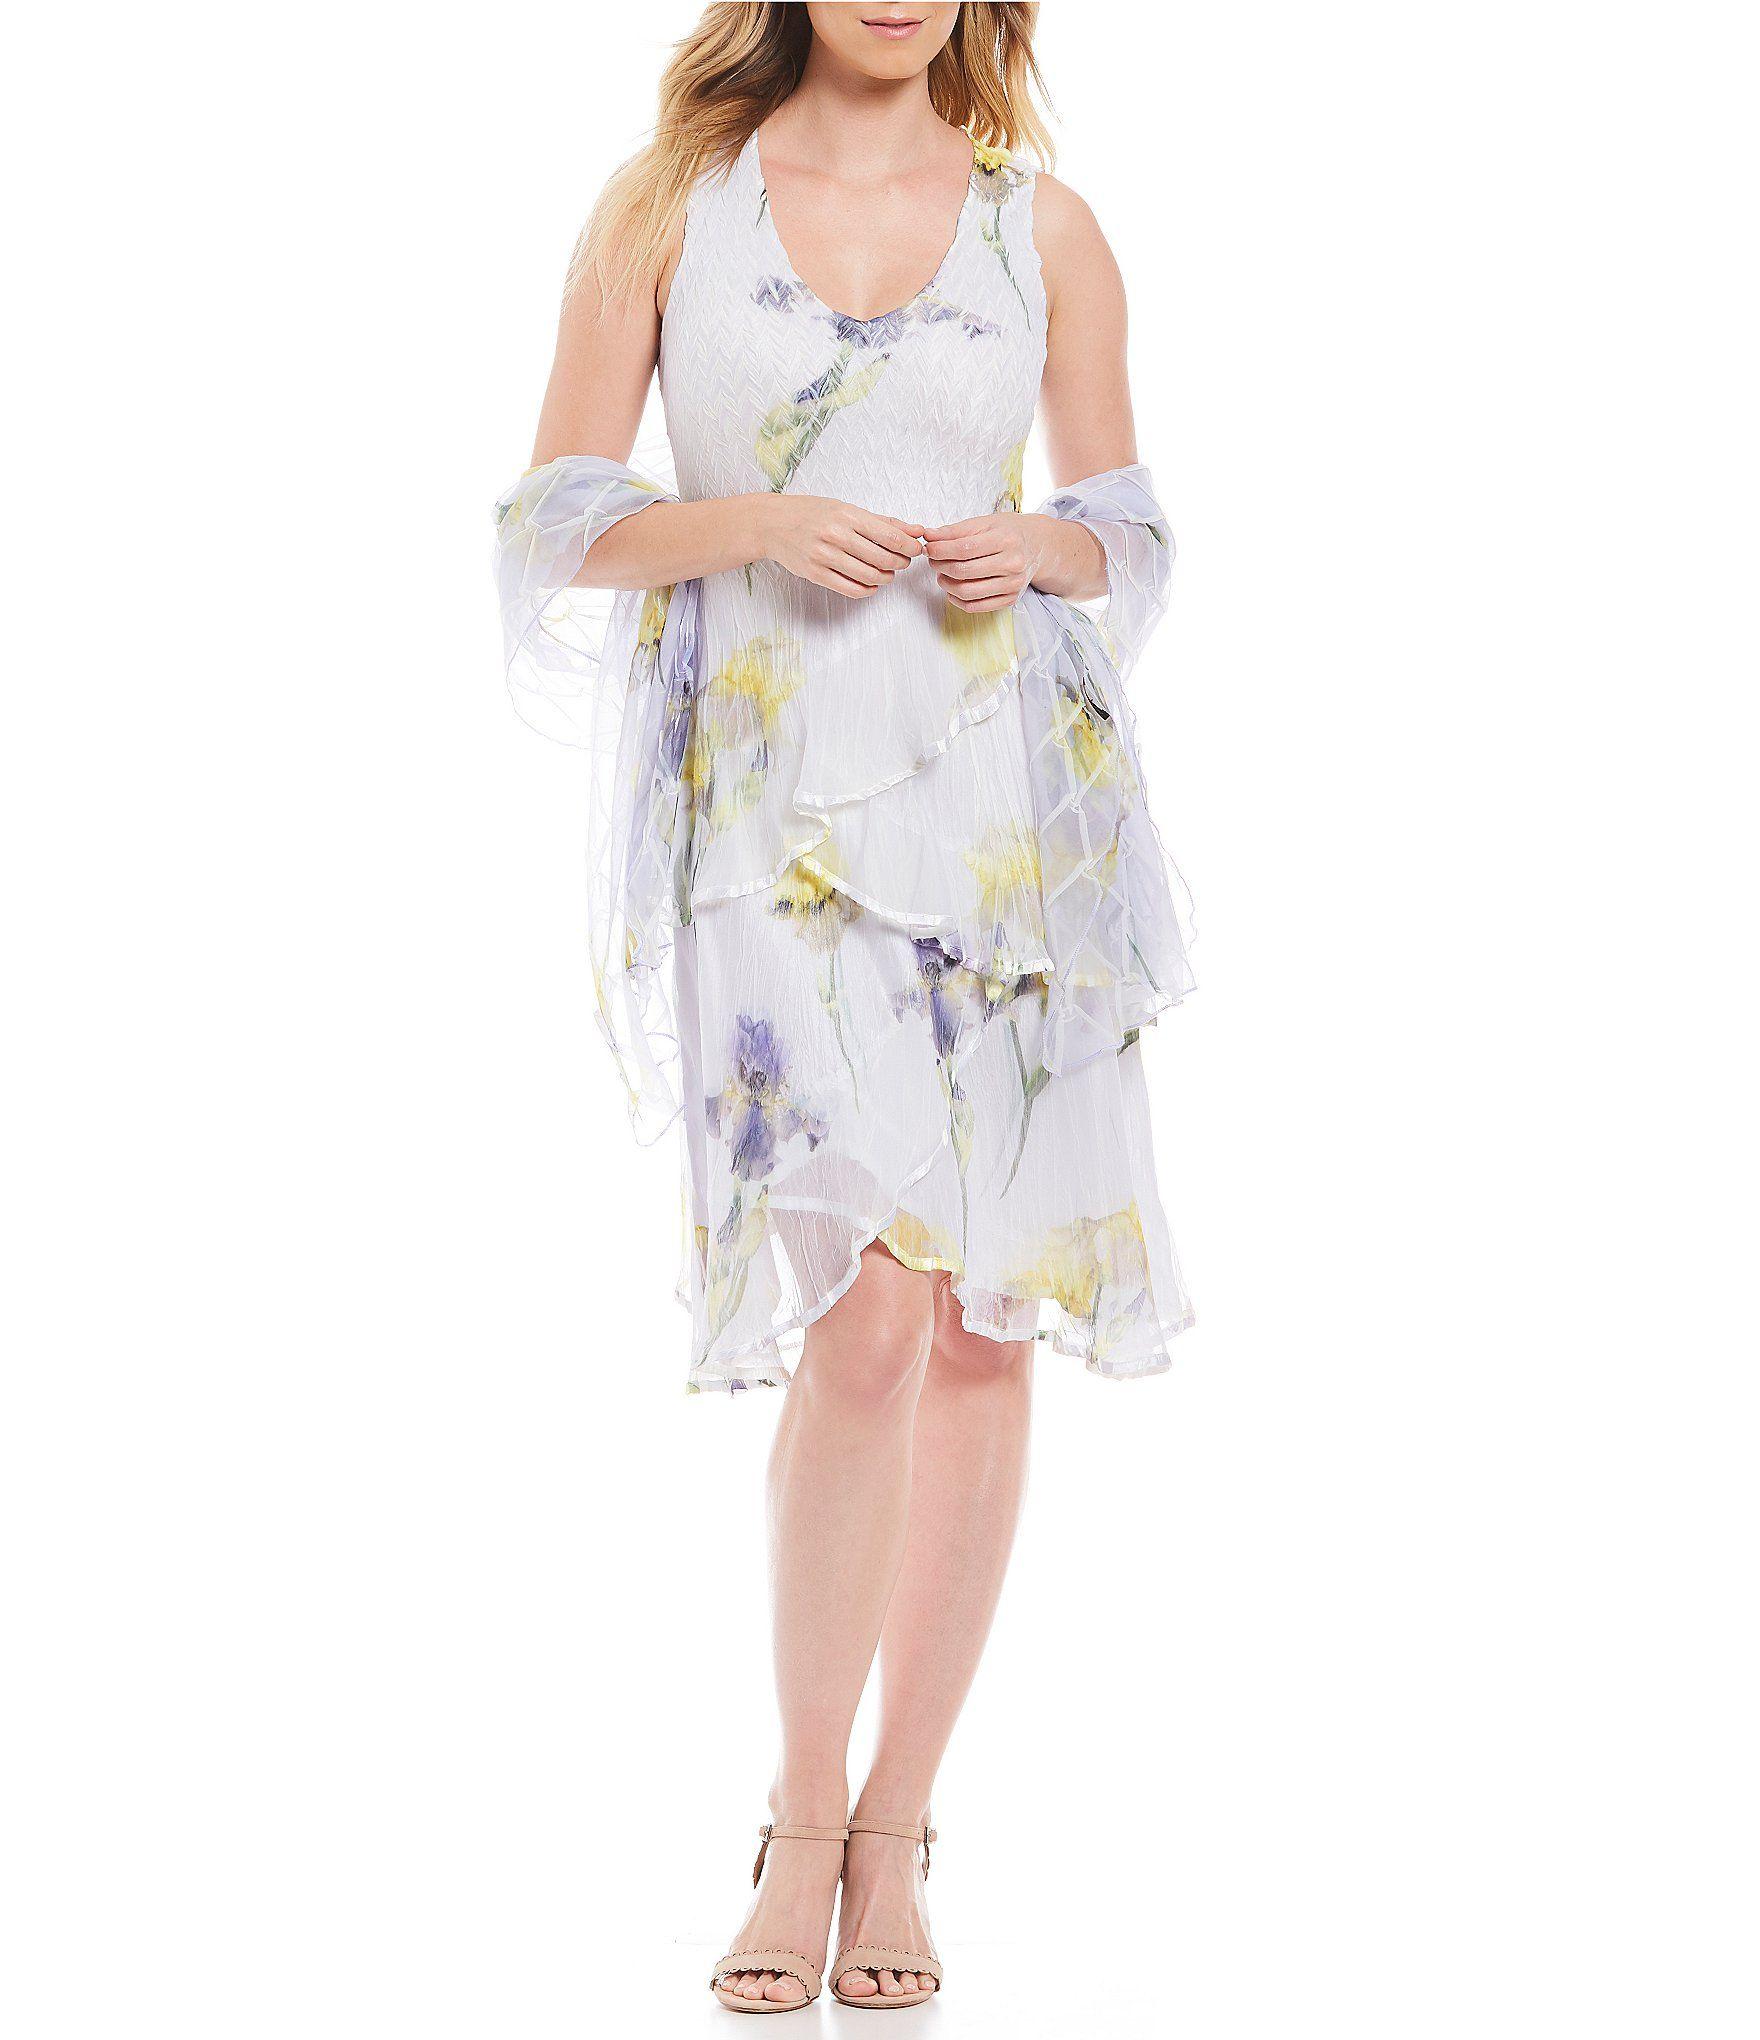 Wedding dresses dillards  Komarov Daffodil Floral Print Tiered Gown  Dillards  Mother Of The